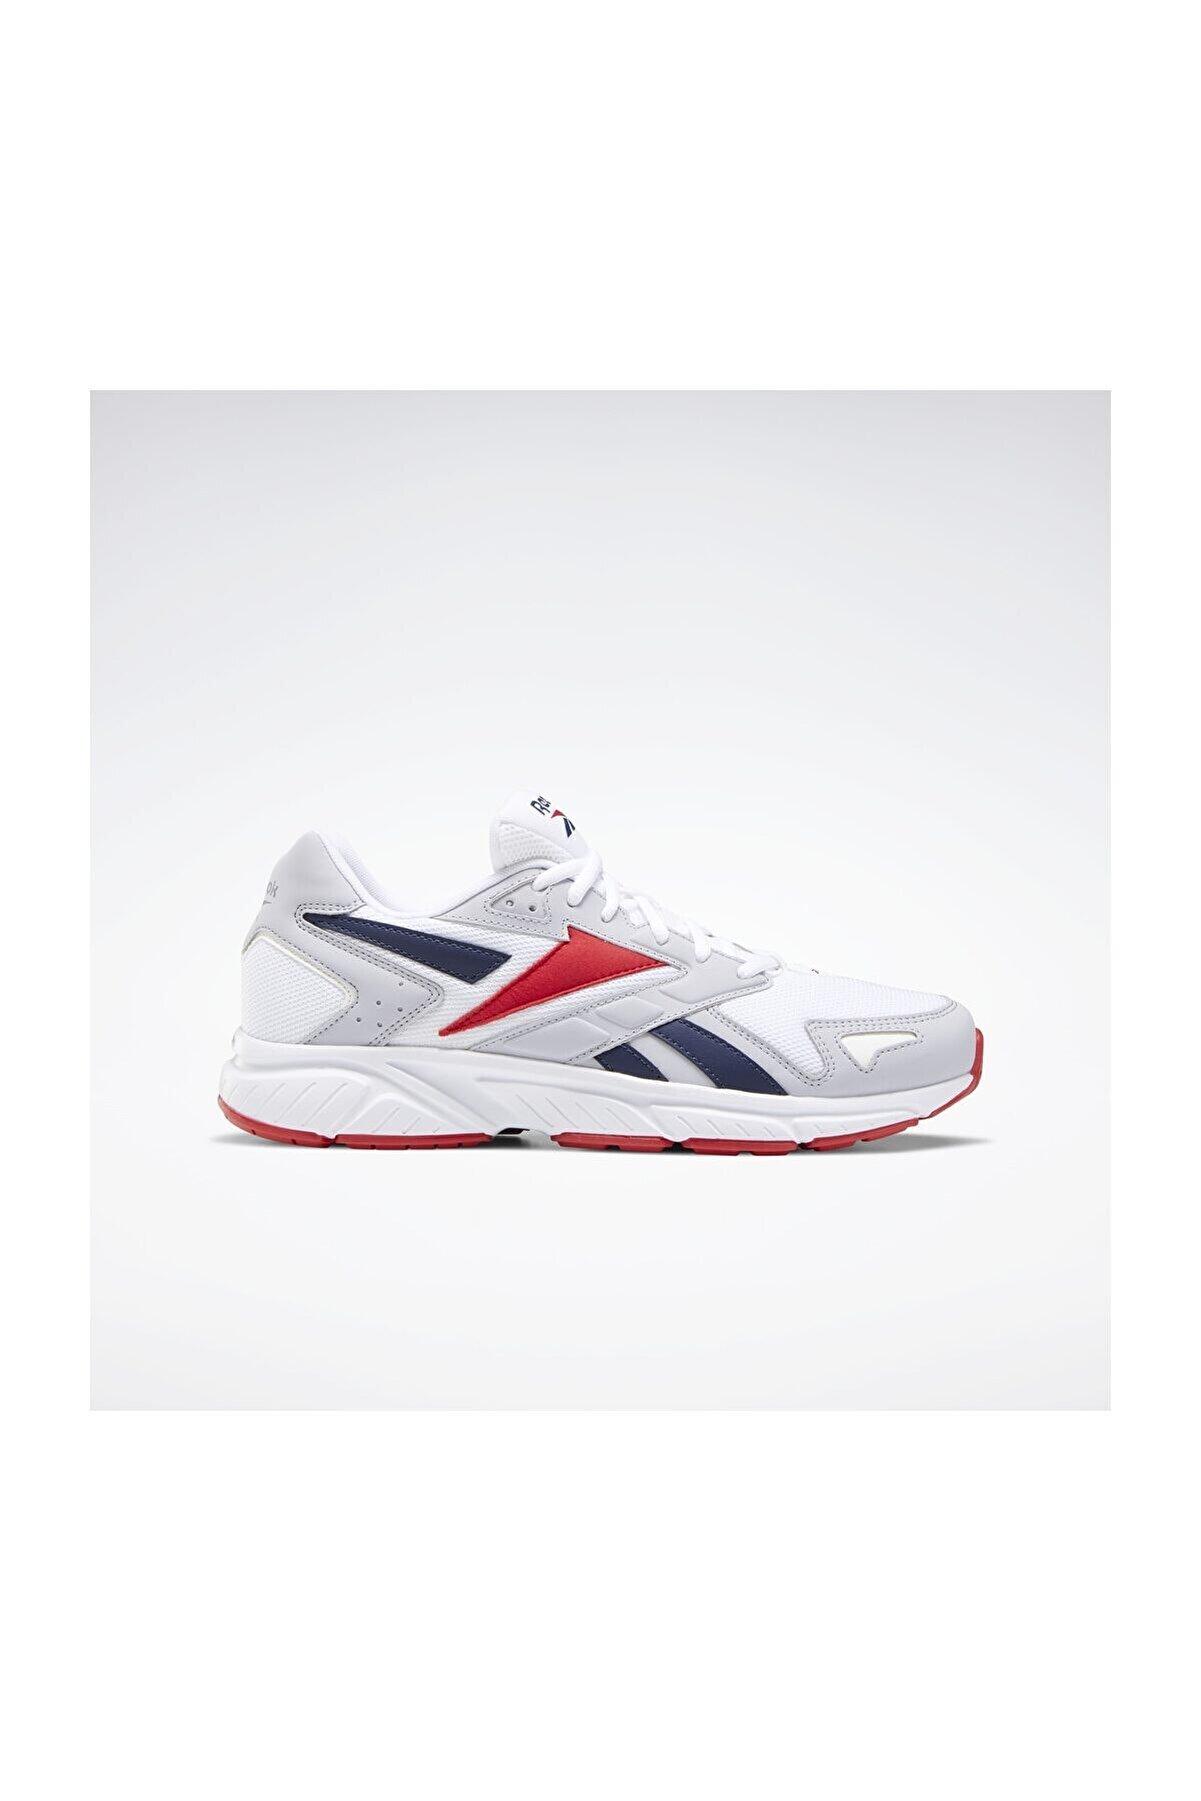 Reebok ROYAL HYPERIUM Gri Erkek Sneaker Ayakkabı 100664884